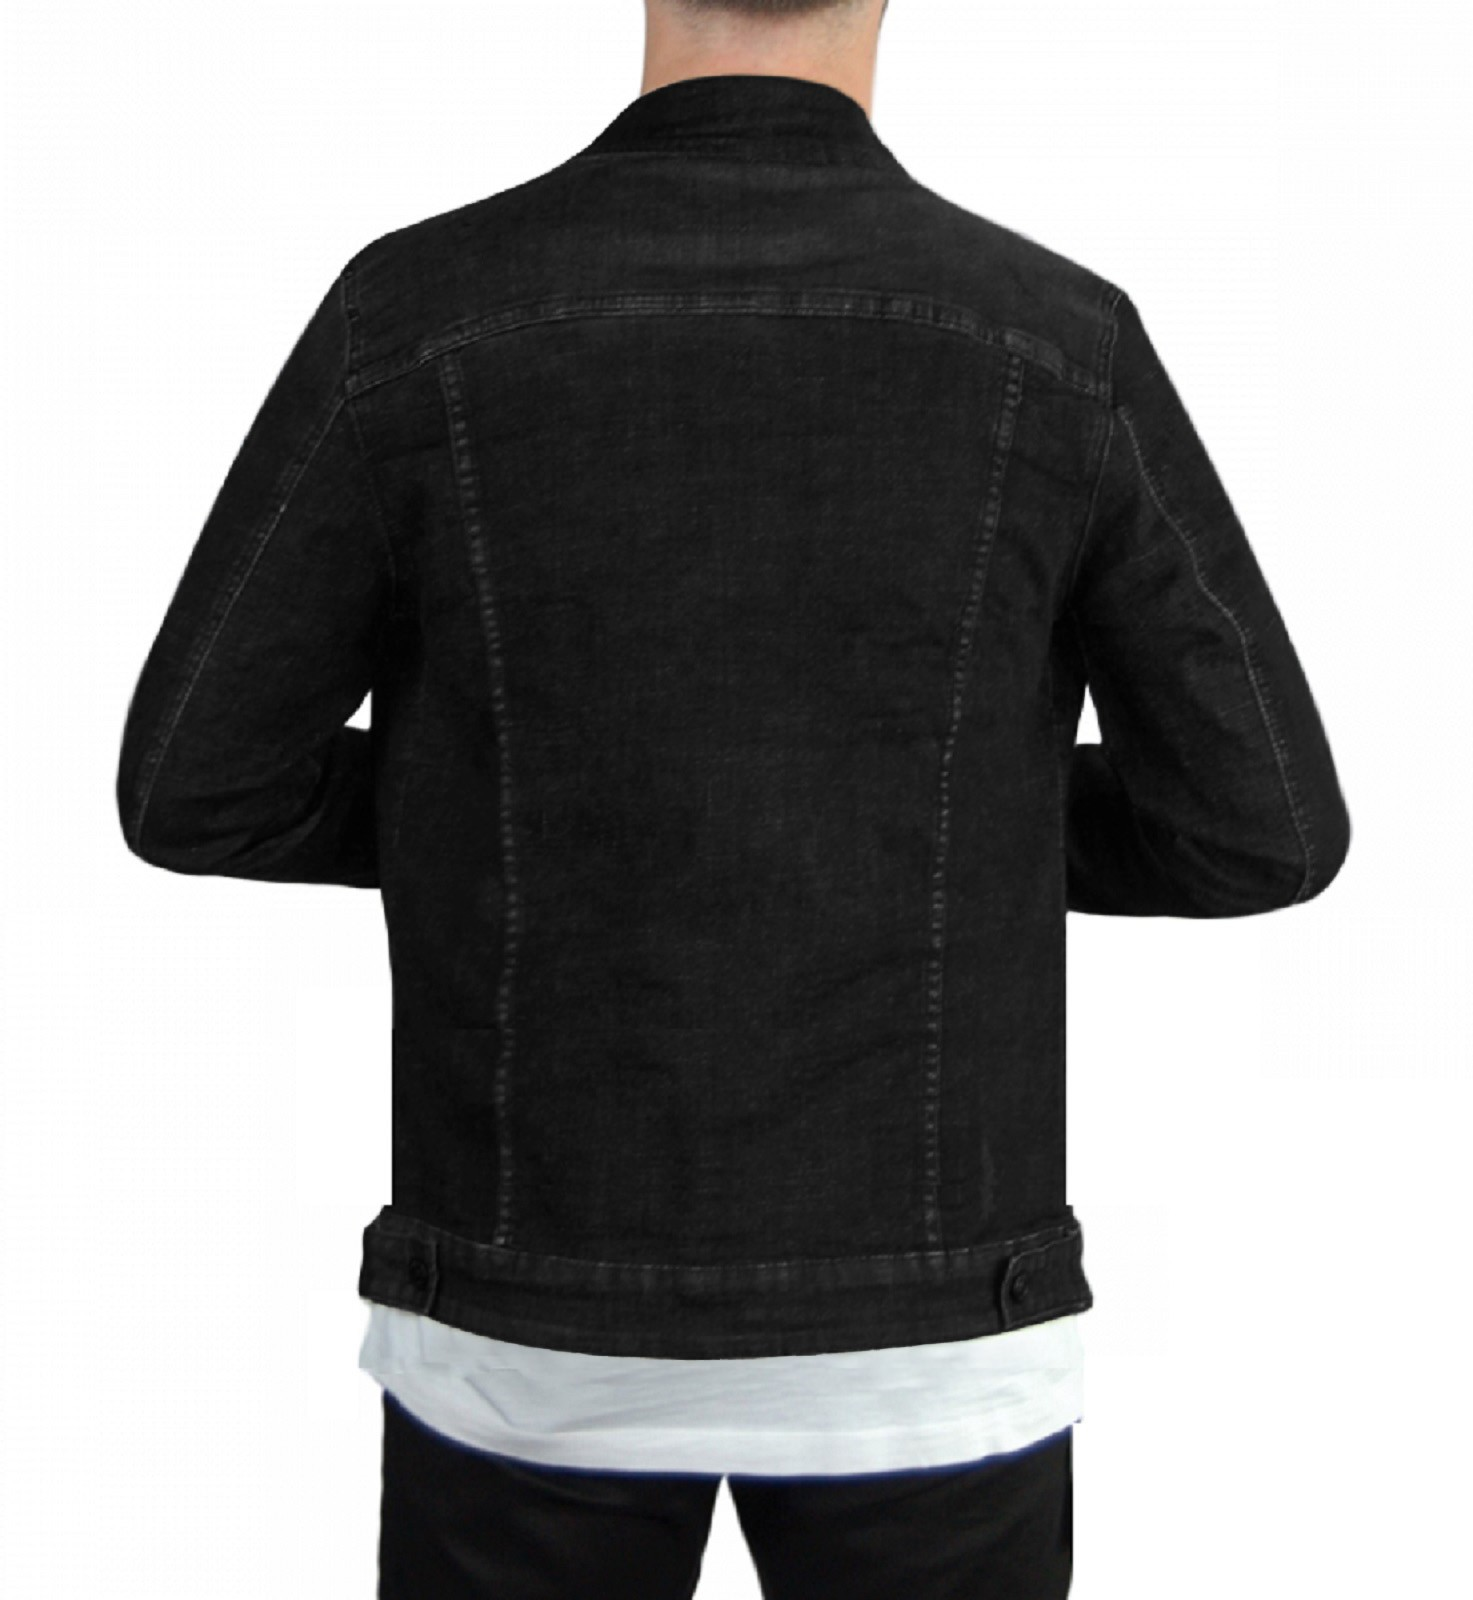 Giubbino-Uomo-Jeans-Giubbotto-Nero-Vintage-Giacca-Slim-fit-Denim-Casual miniatura 9